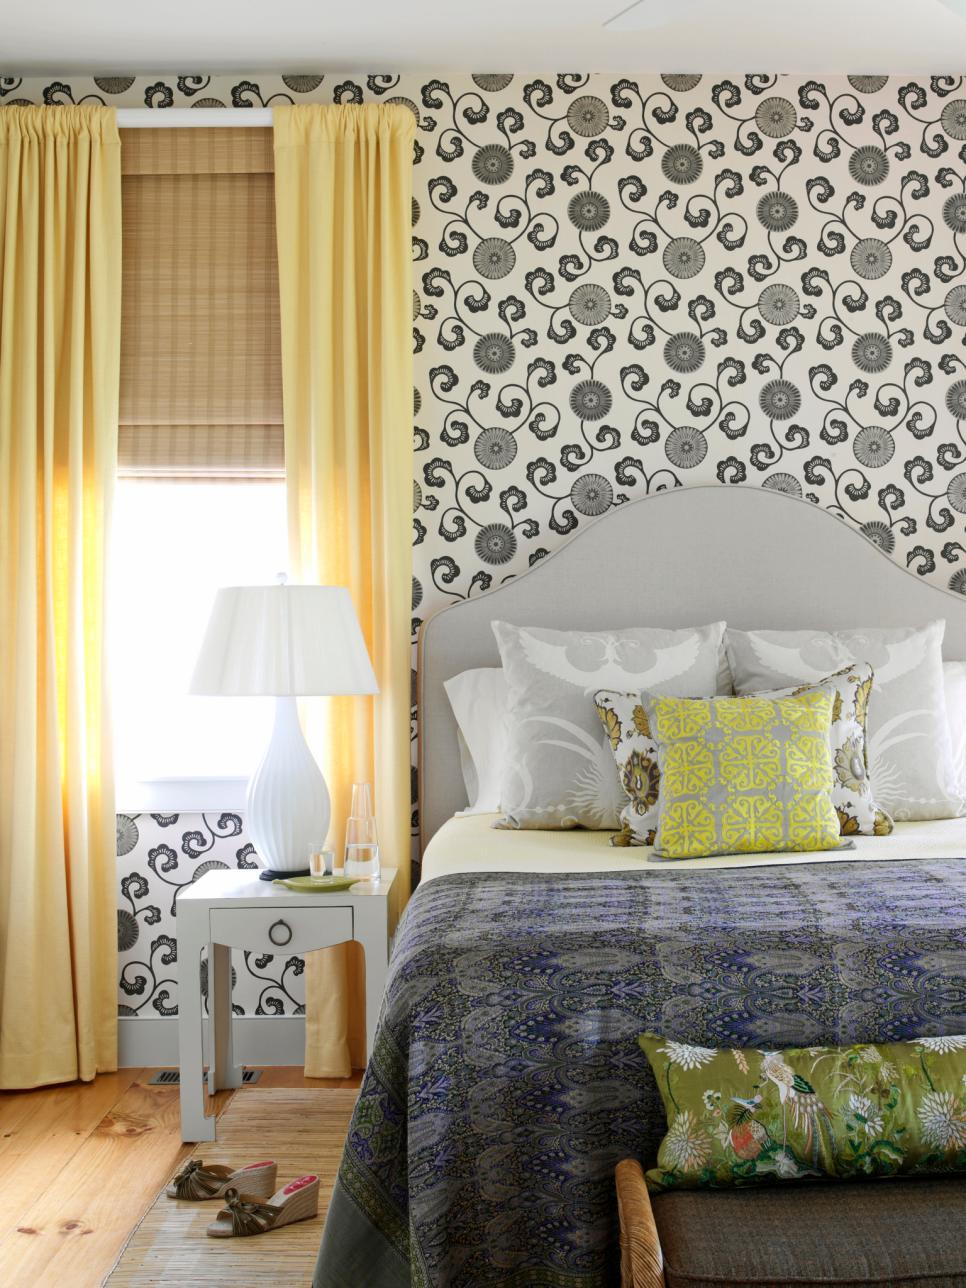 original_tara-seawright-noir-blanc-papier peint-chambre-jpg-rend-hgtvcom-966-1288